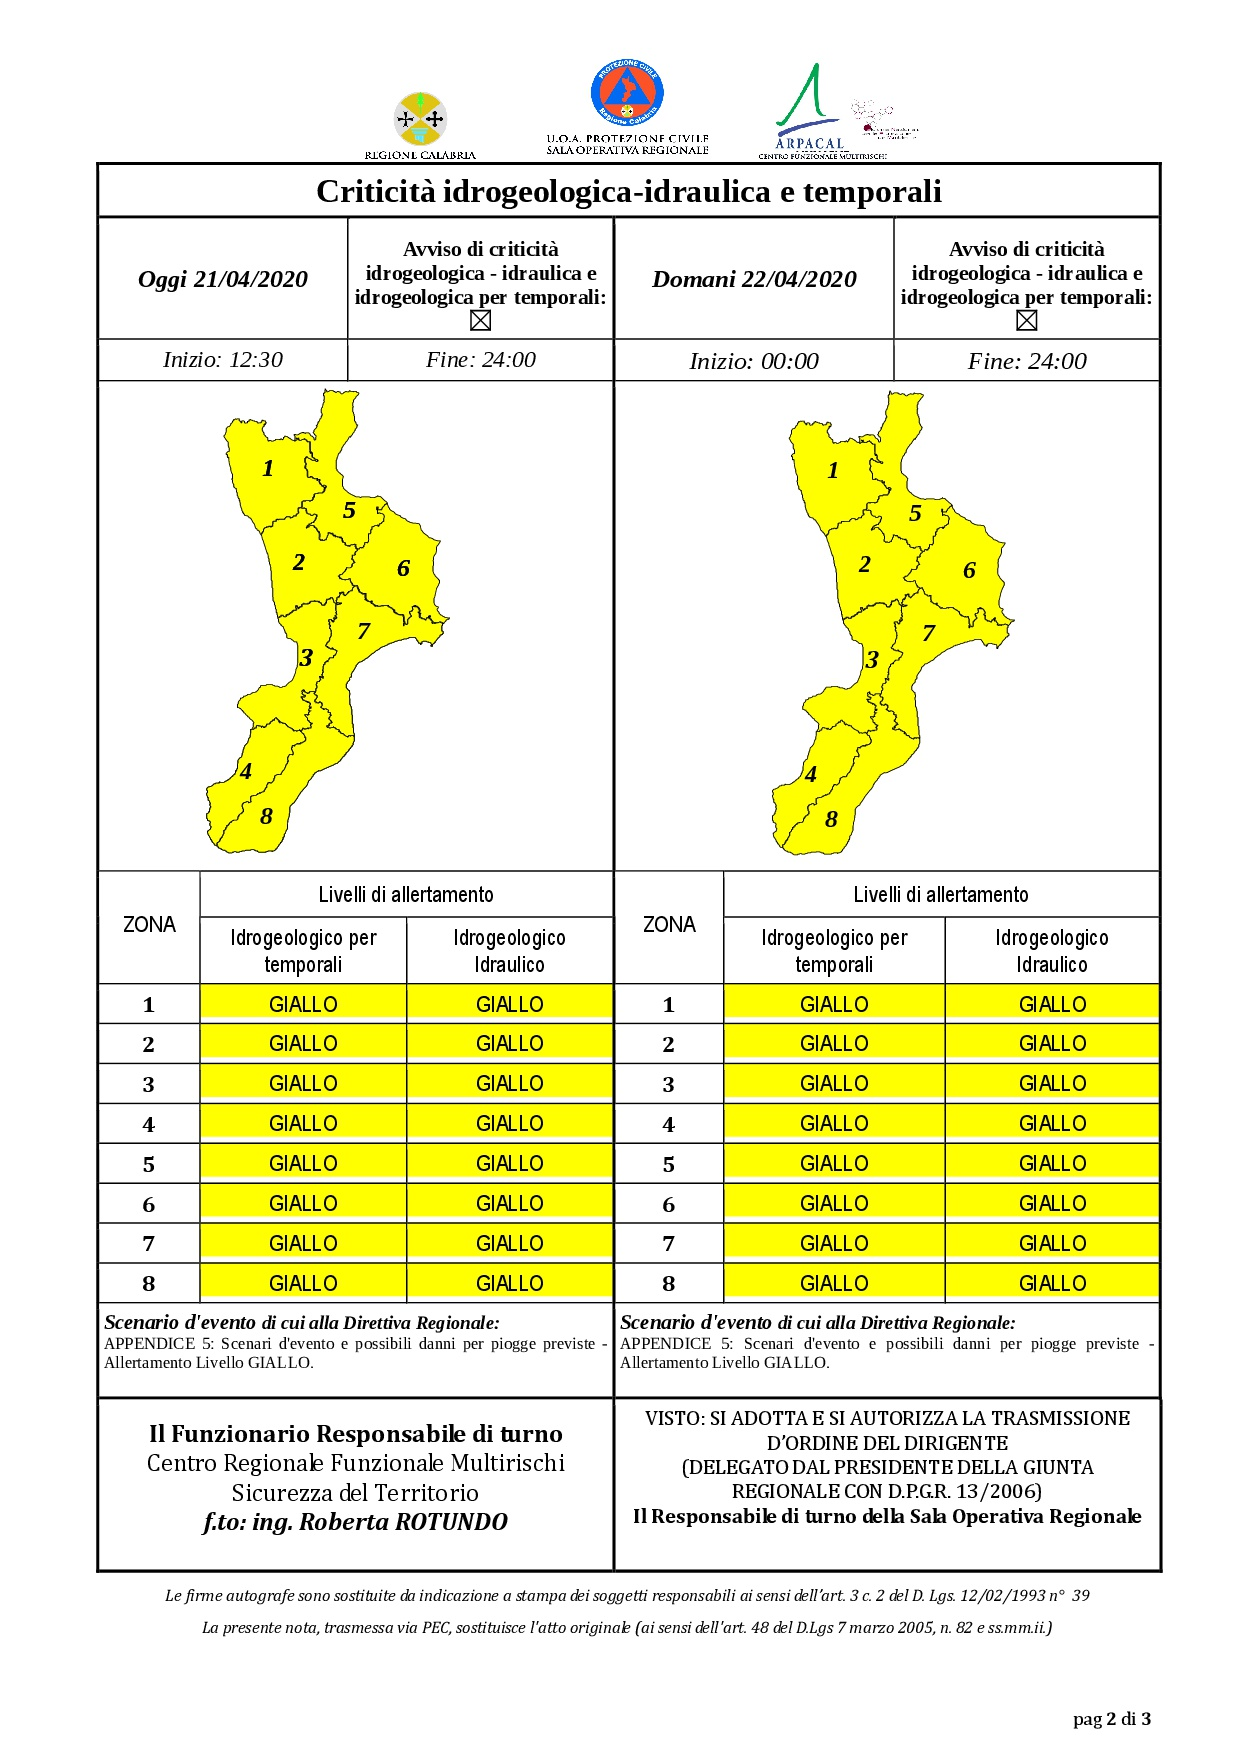 Criticità idrogeologica-idraulica e temporali in Calabria 21-04-2020